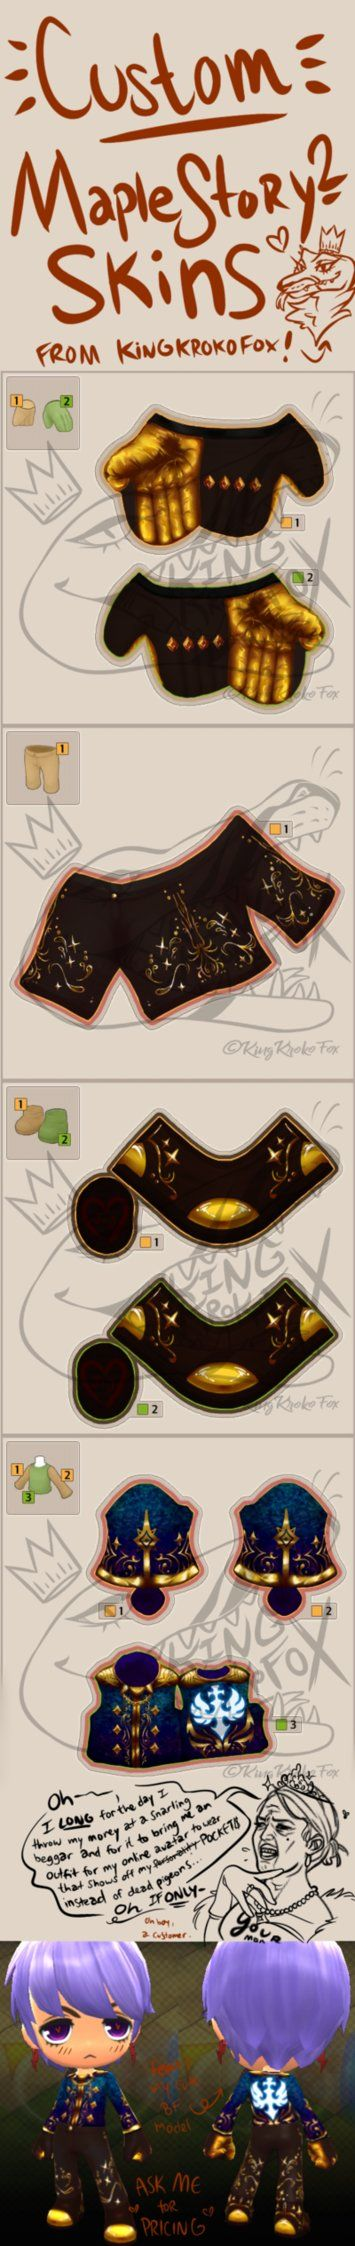 Maple Story 2 Custom Skins by KingKrokoFox | Maple story in